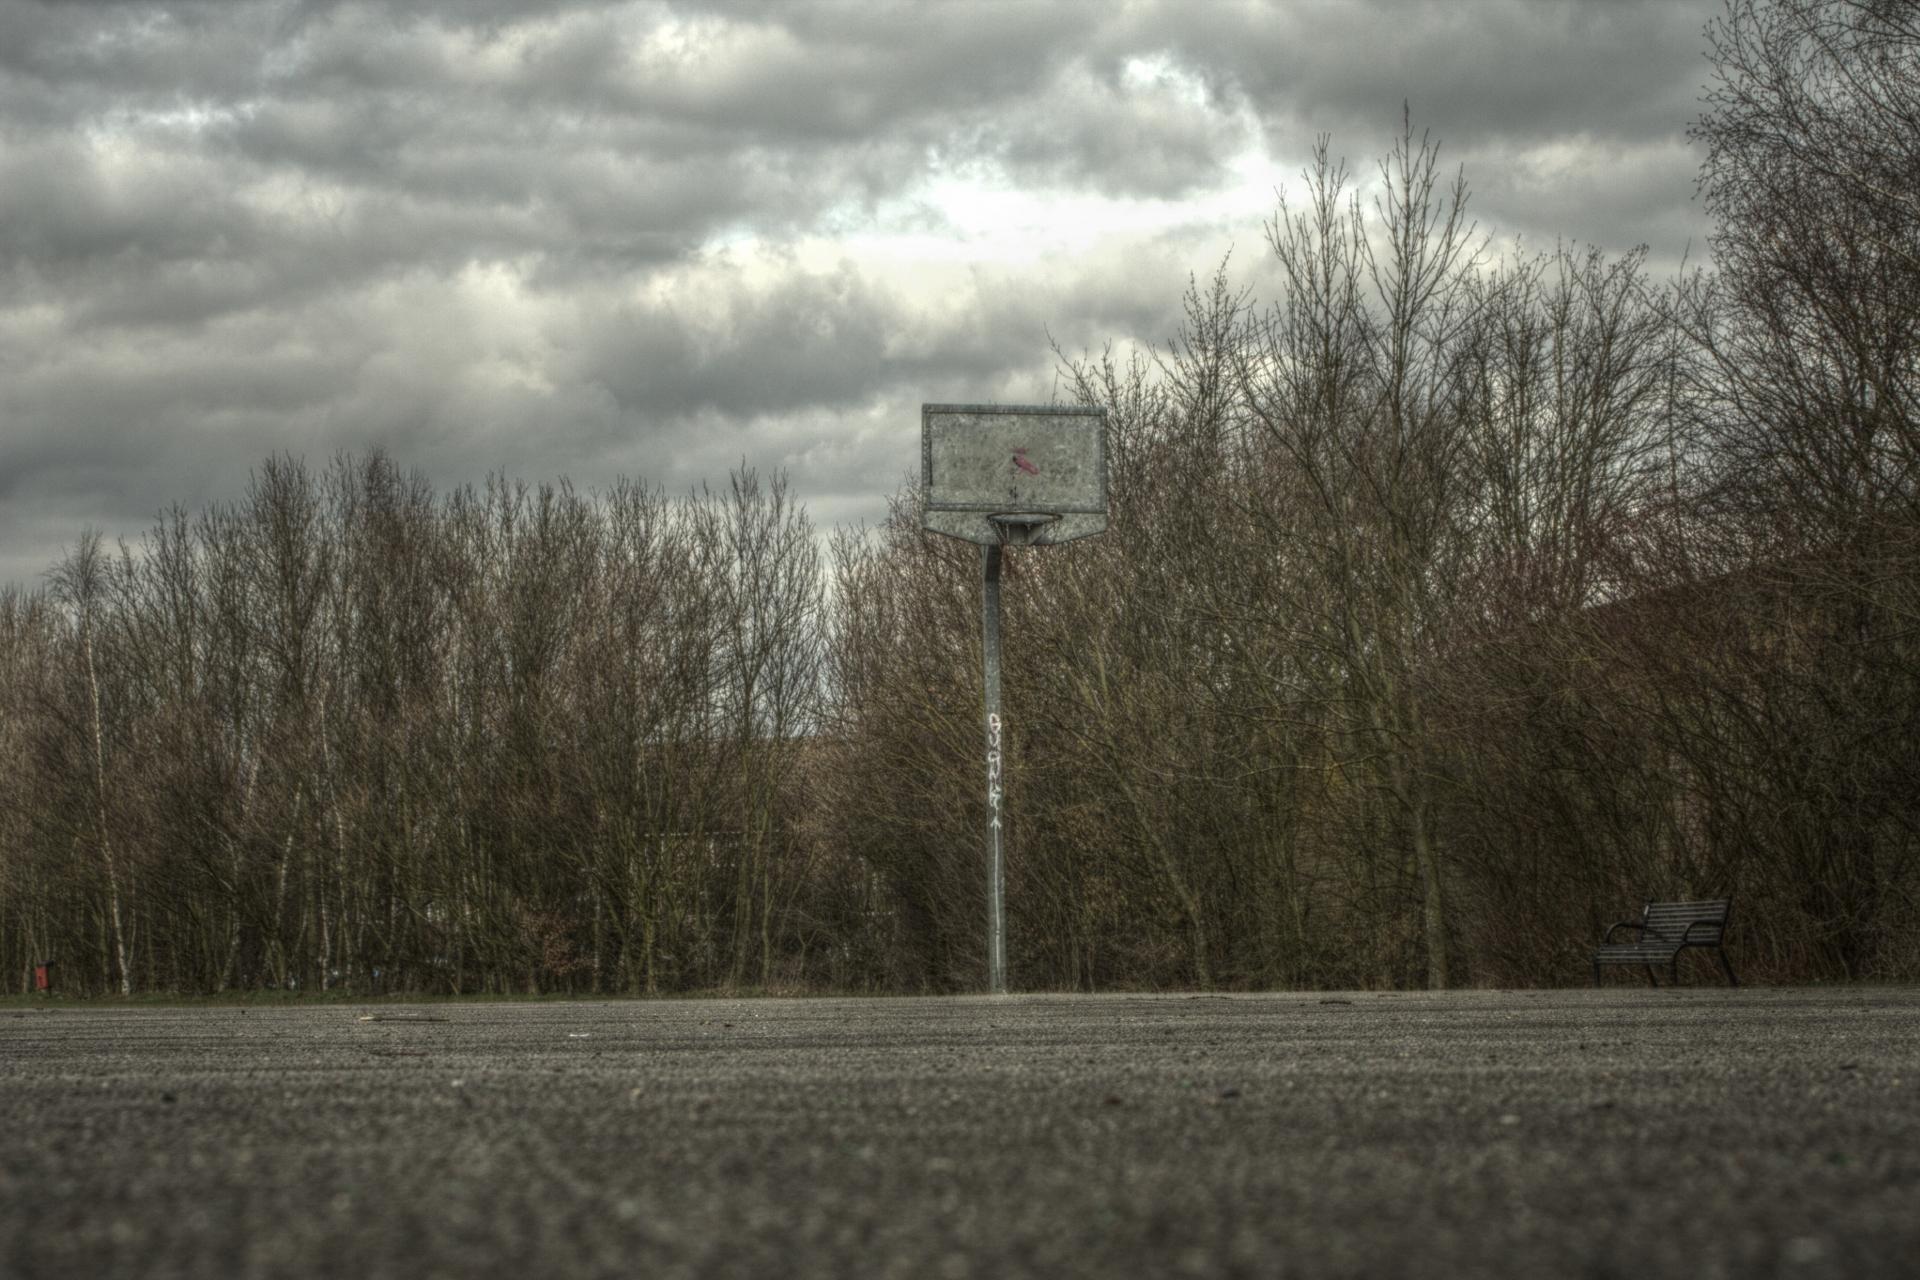 Wallpaper Girl Hd Free Download Basketball Court Background Hd Pixelstalk Net